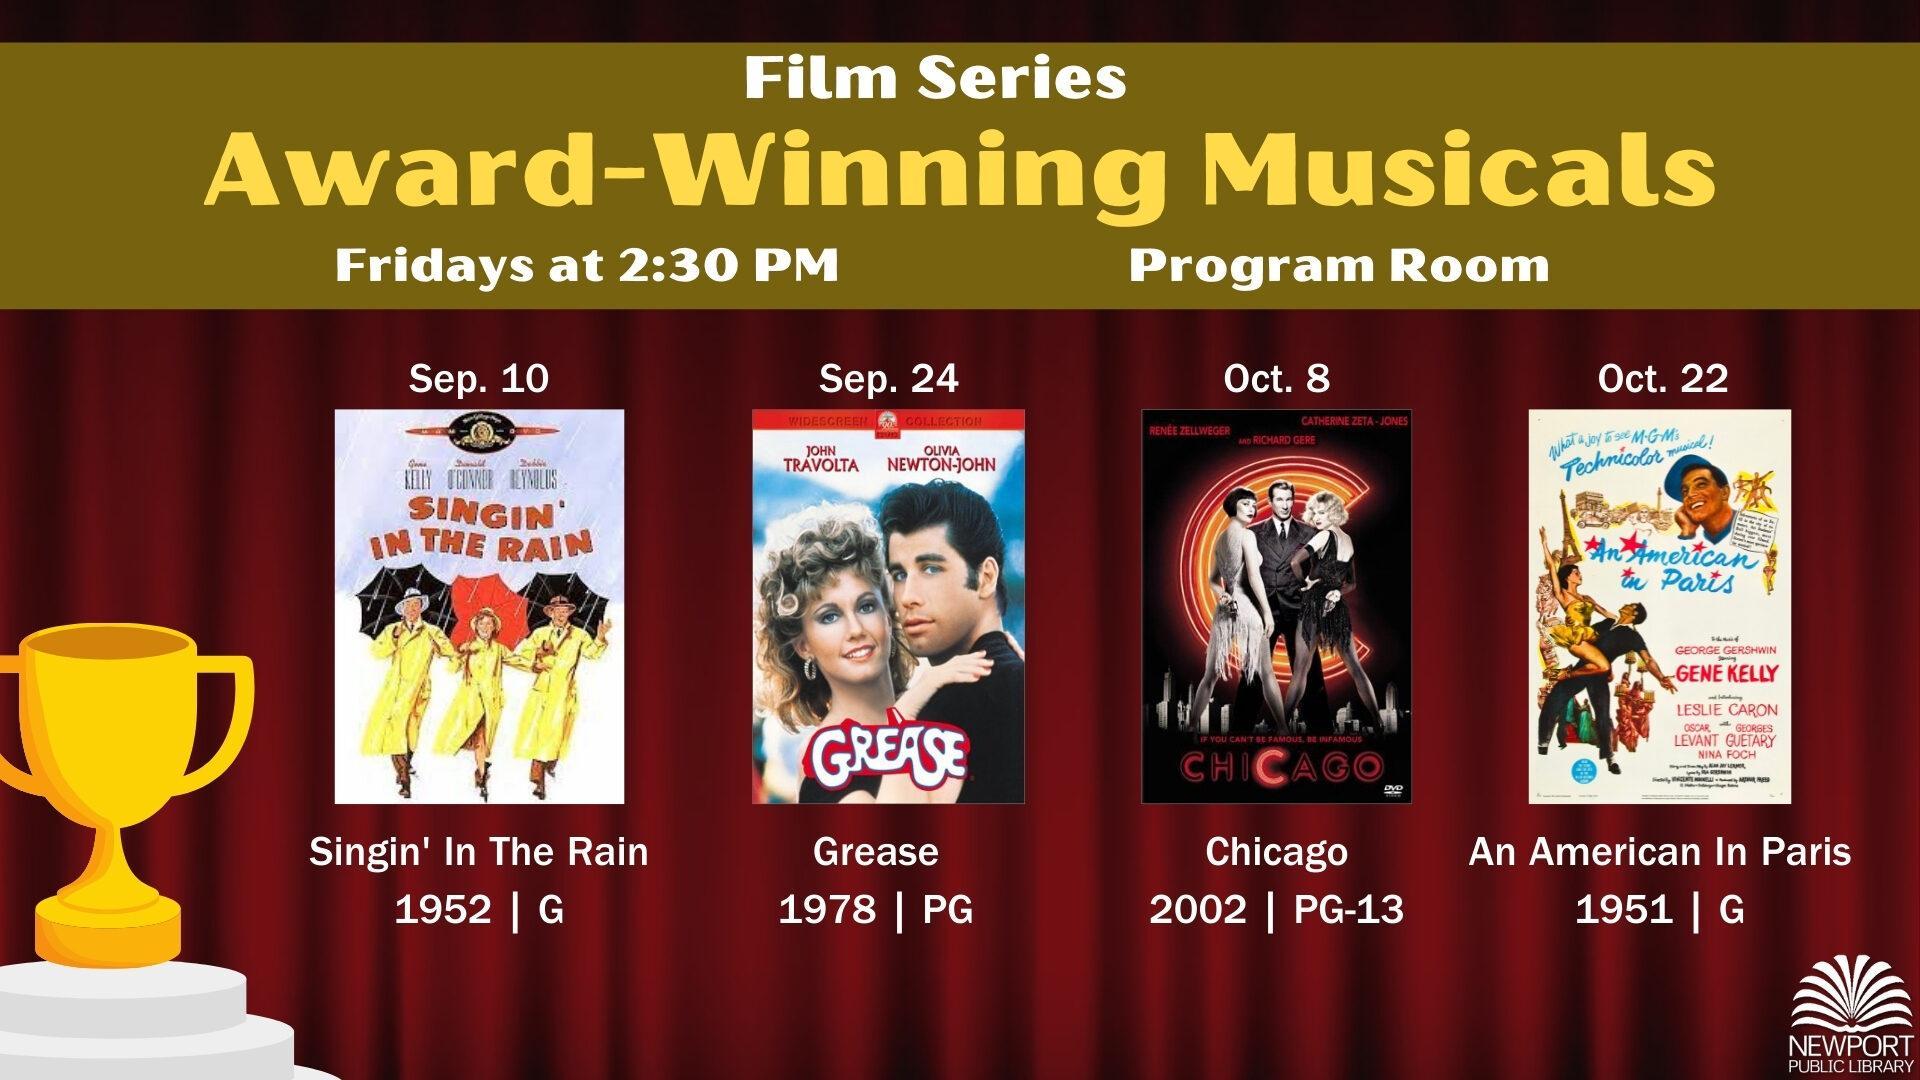 Film Series: Award-Winning Musicals